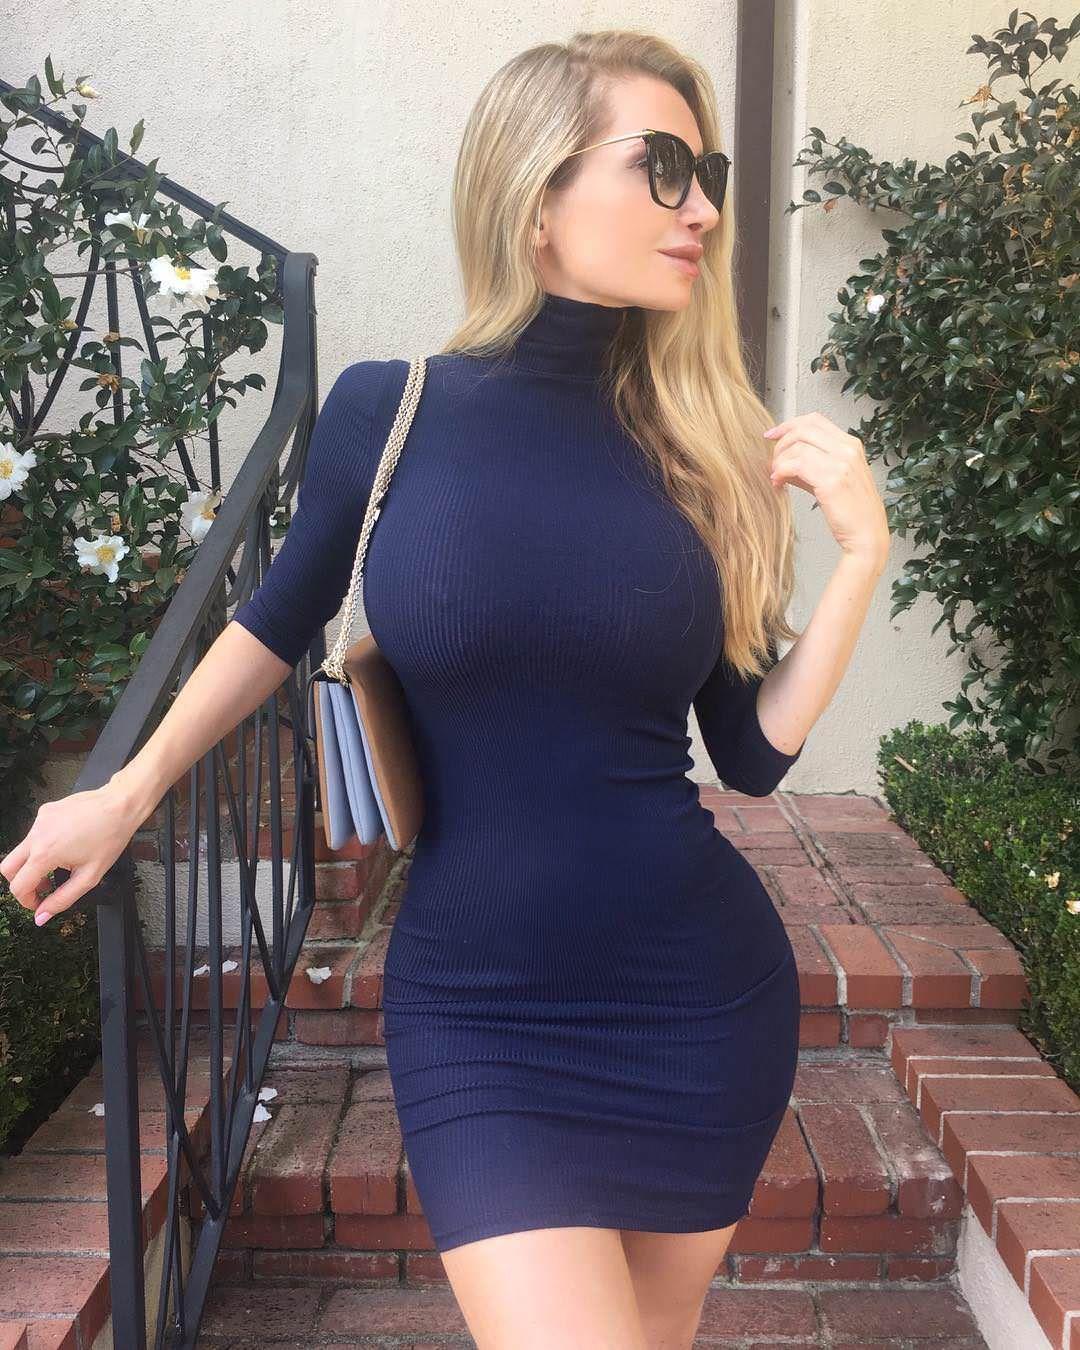 Amanda Elise Lee Amanda Lee Tight Dresses Fashion